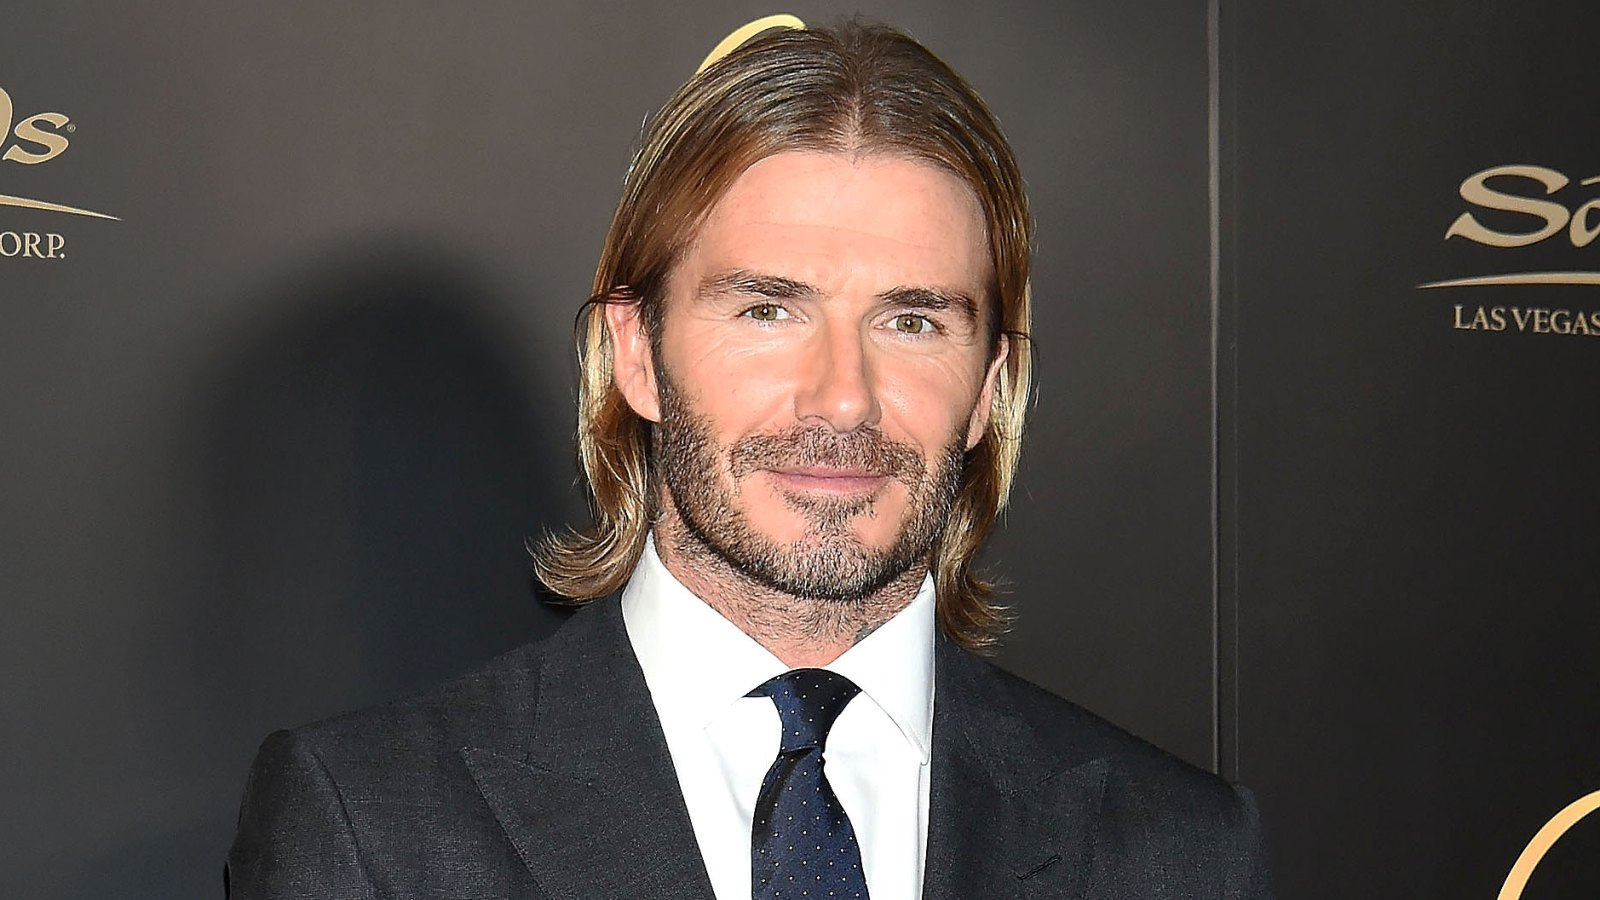 David Beckham Debuts Short Hair In Macau